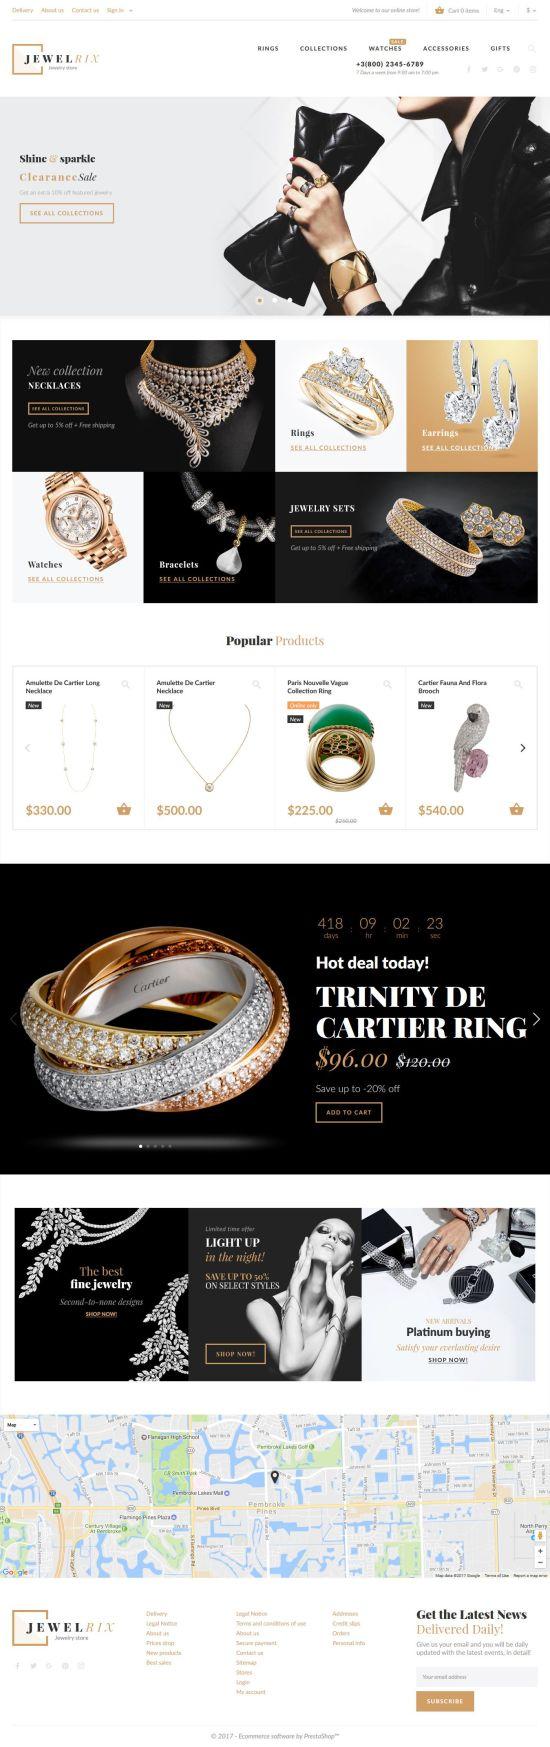 jewelrix prestashop themes template monter themes 01 550x1747 - Jewelrix Prestashop Theme